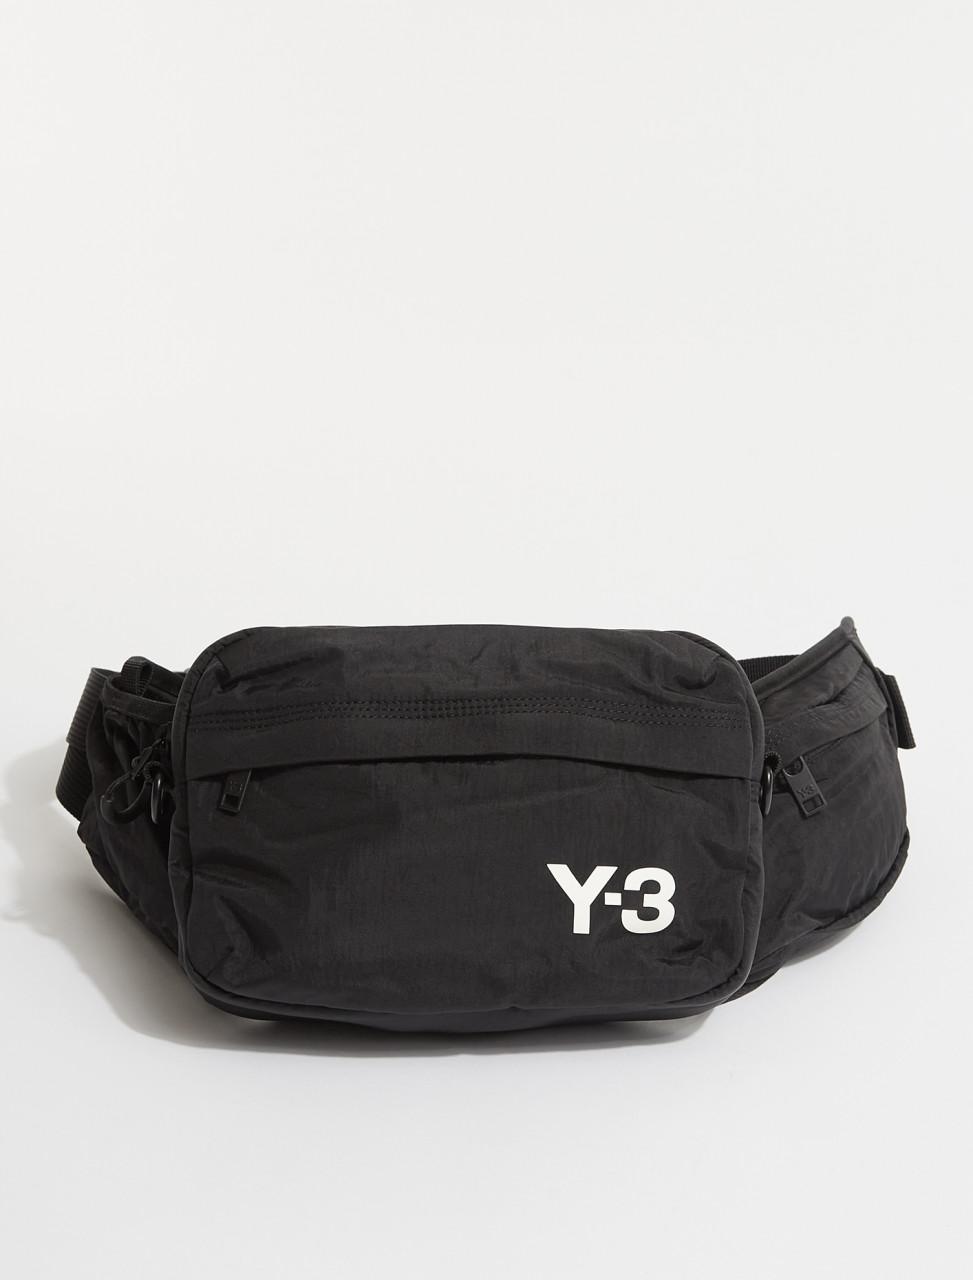 165-FH9244 Y-3 SLING BAG